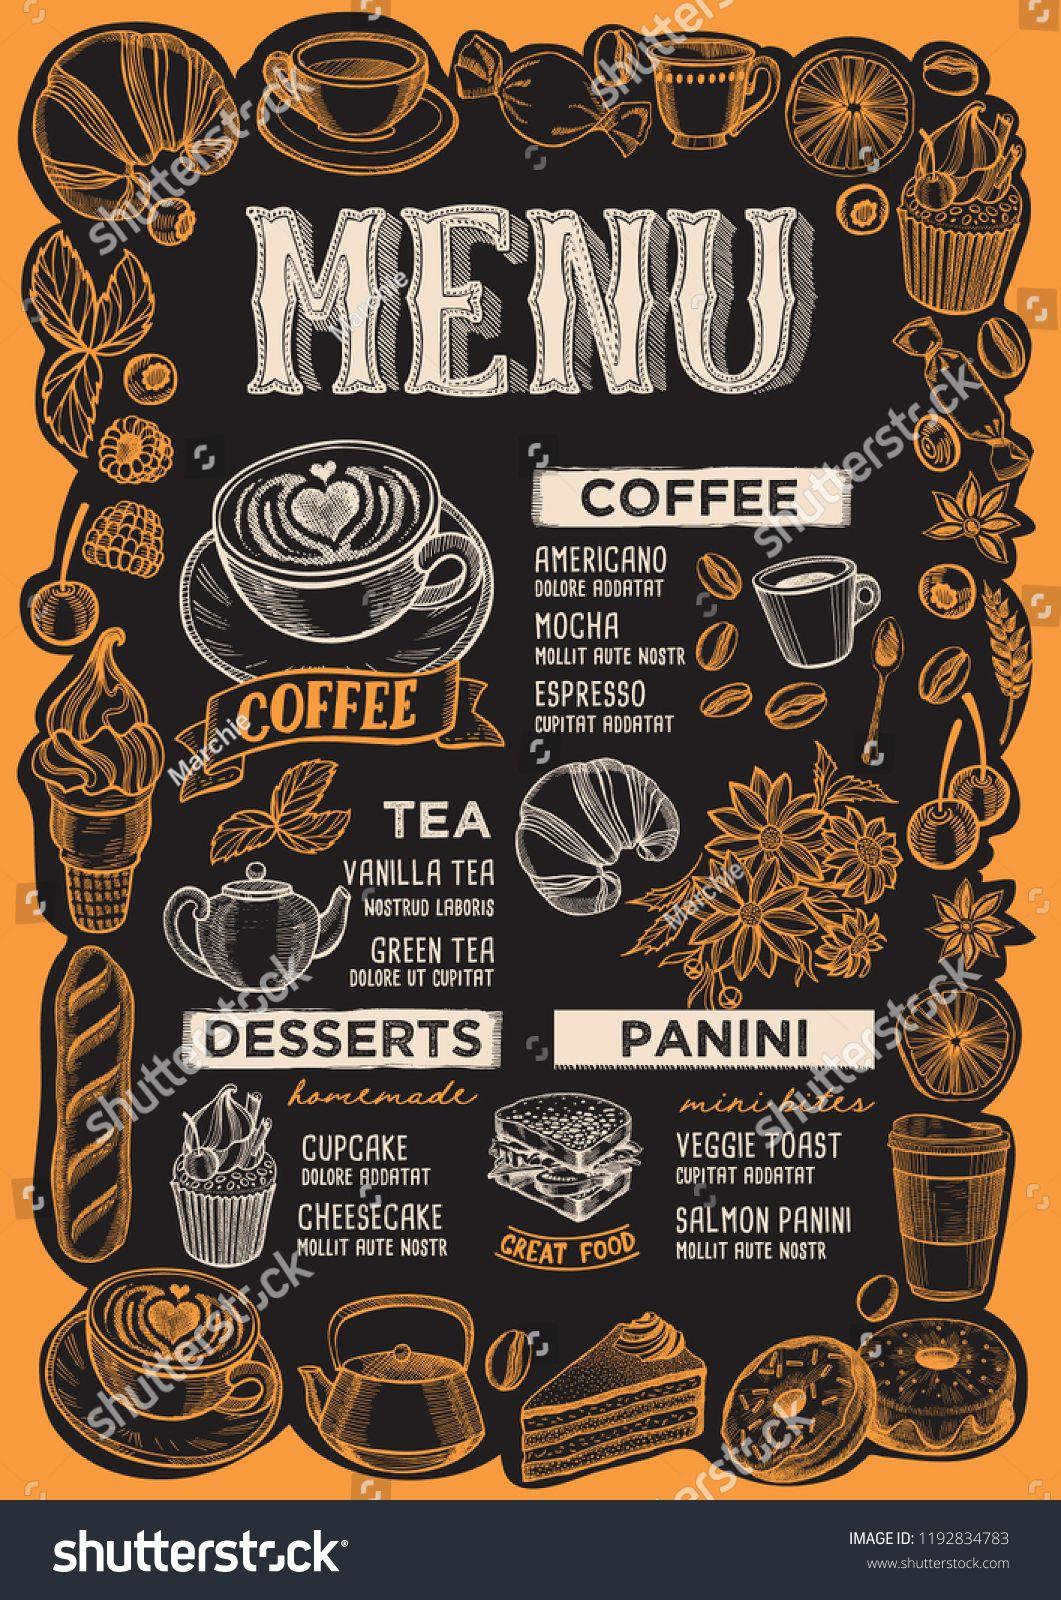 Coffee Menu Template For Restaurant On A Blackboard Background